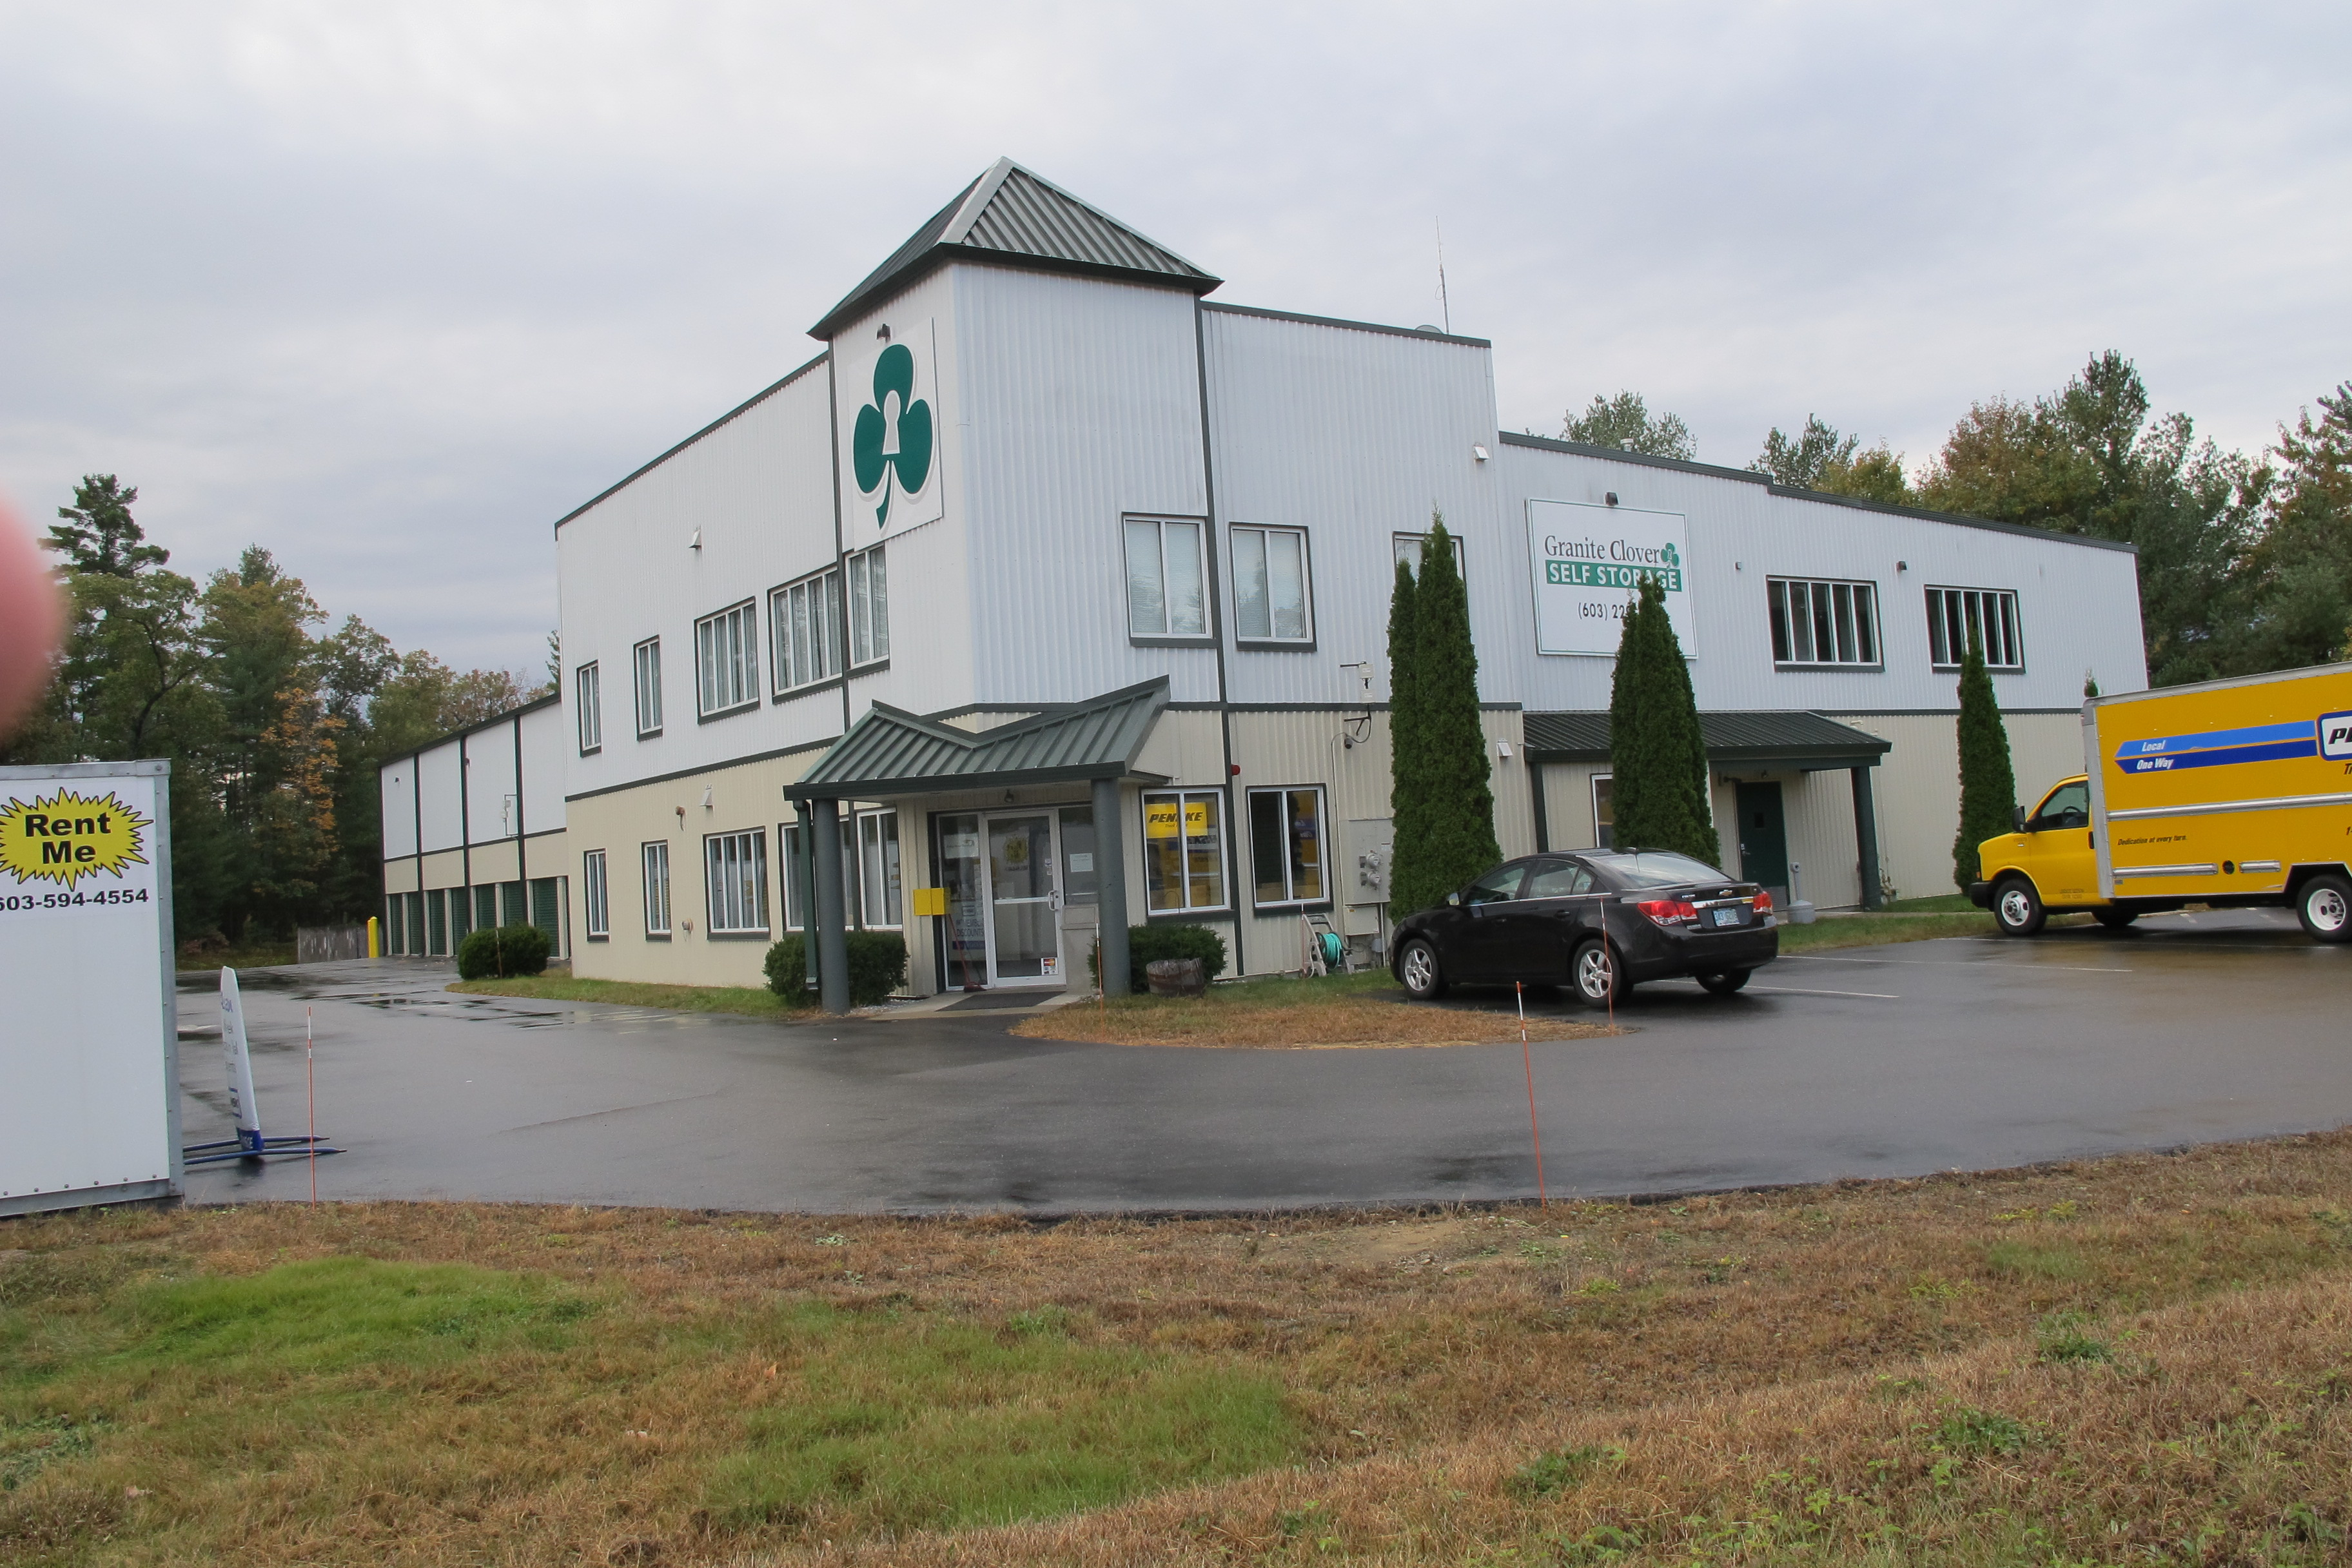 Pembroke NH & Mendola of NAI Norwood Group arranges sale of 5 property portfolio ...